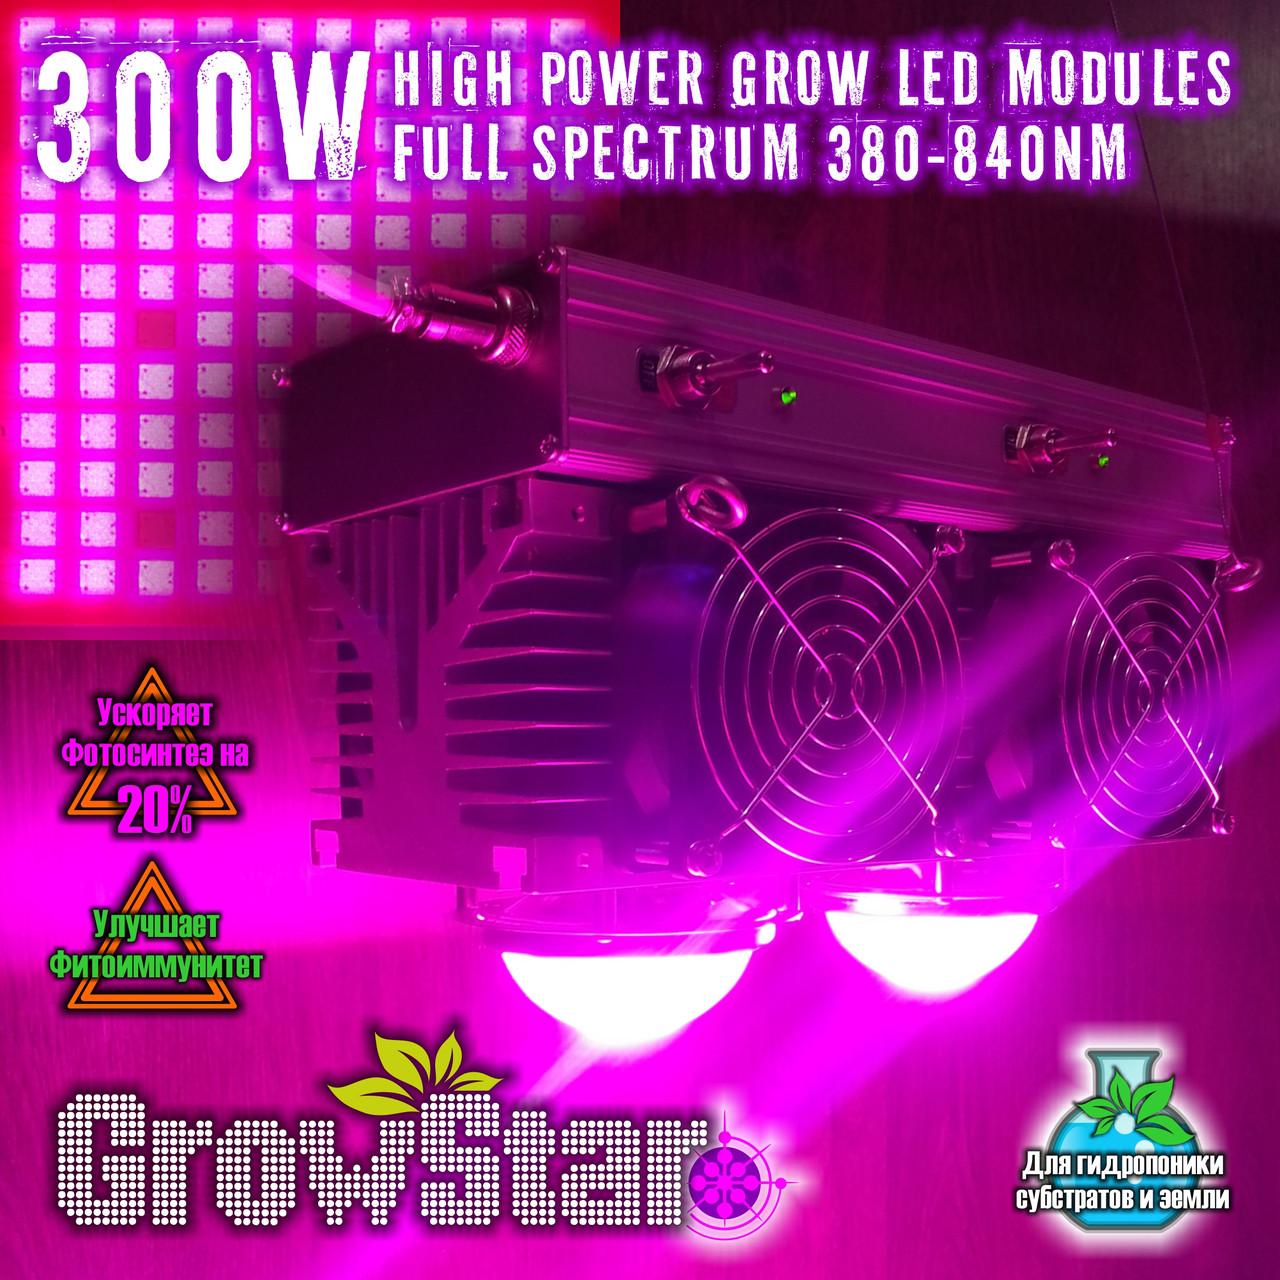 Фитолампа GrowStar 300W Полноспектровая. Grow LED Lamp 300W Full Spectrum 340-840nm.